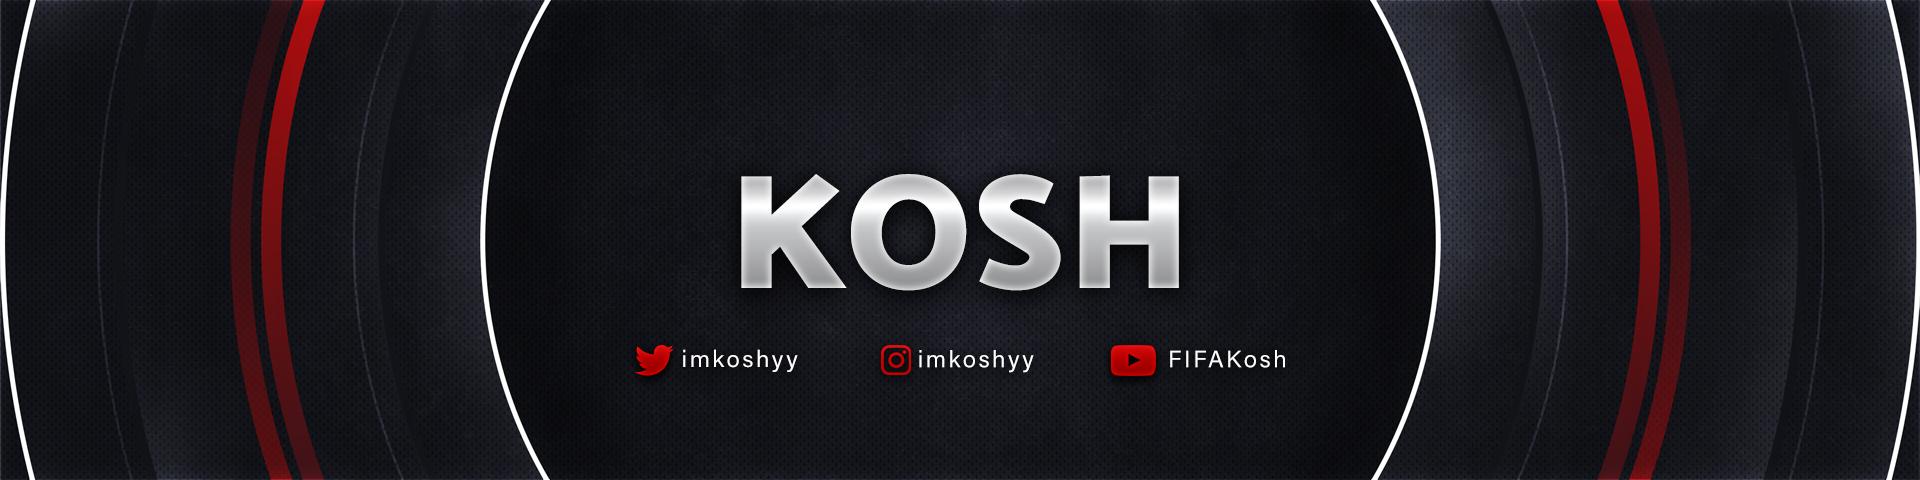 Koshbanner.png